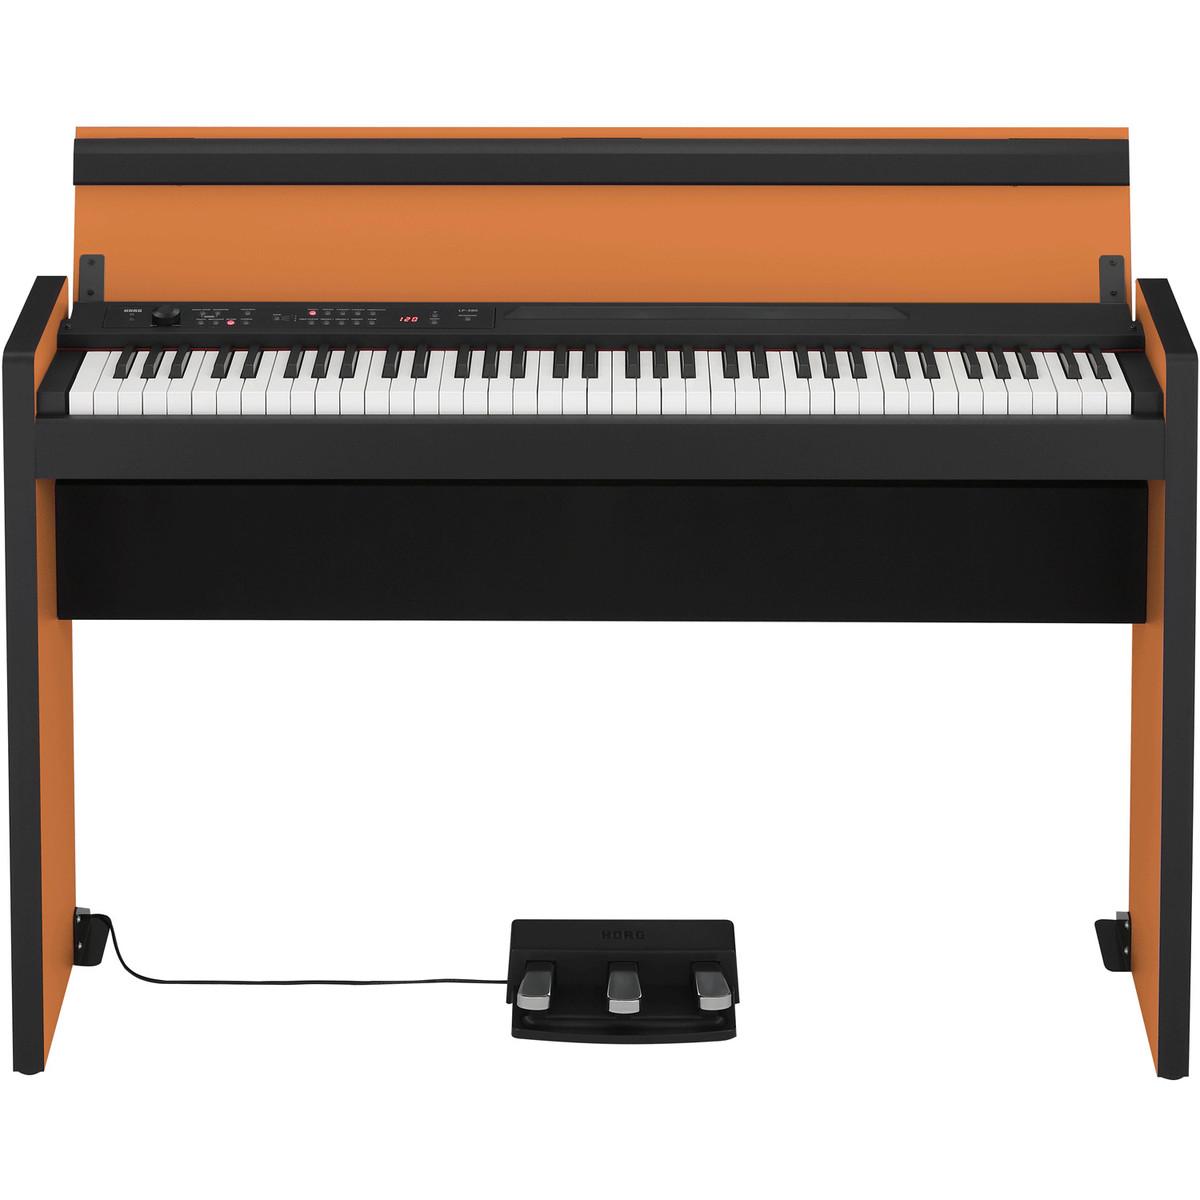 korg lp 380 73 key digital piano black and orange at gear4music. Black Bedroom Furniture Sets. Home Design Ideas